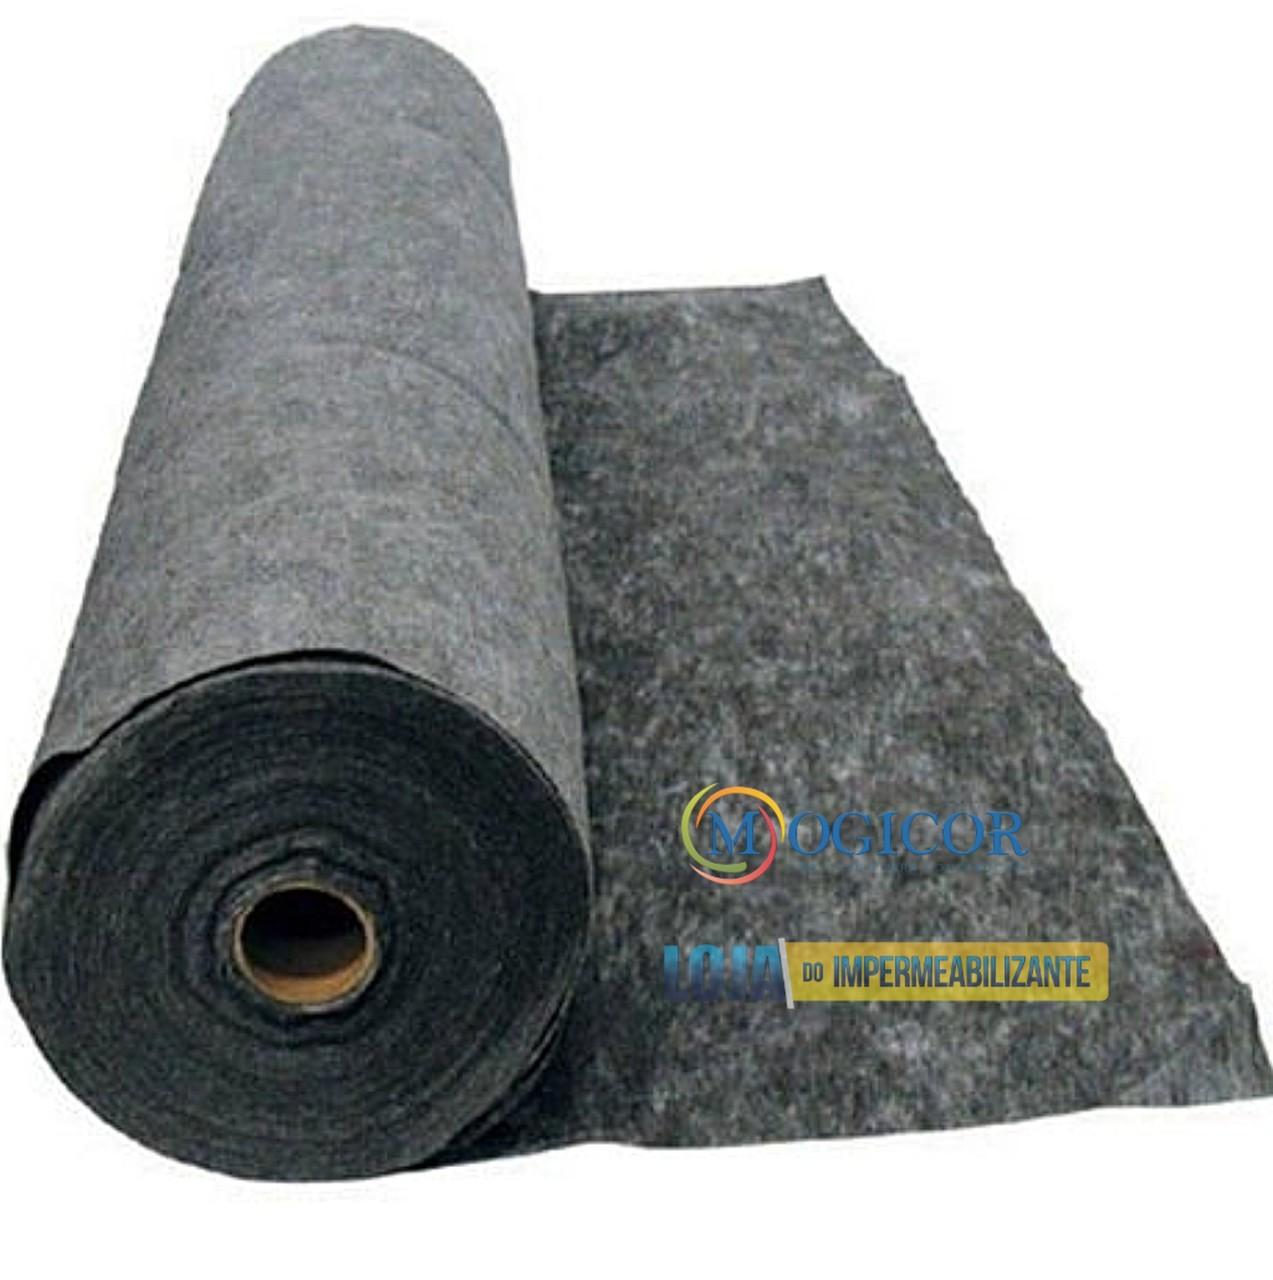 Manta Geotêxtil GT07 Bidim ® ROLOS 230m² e 215m²